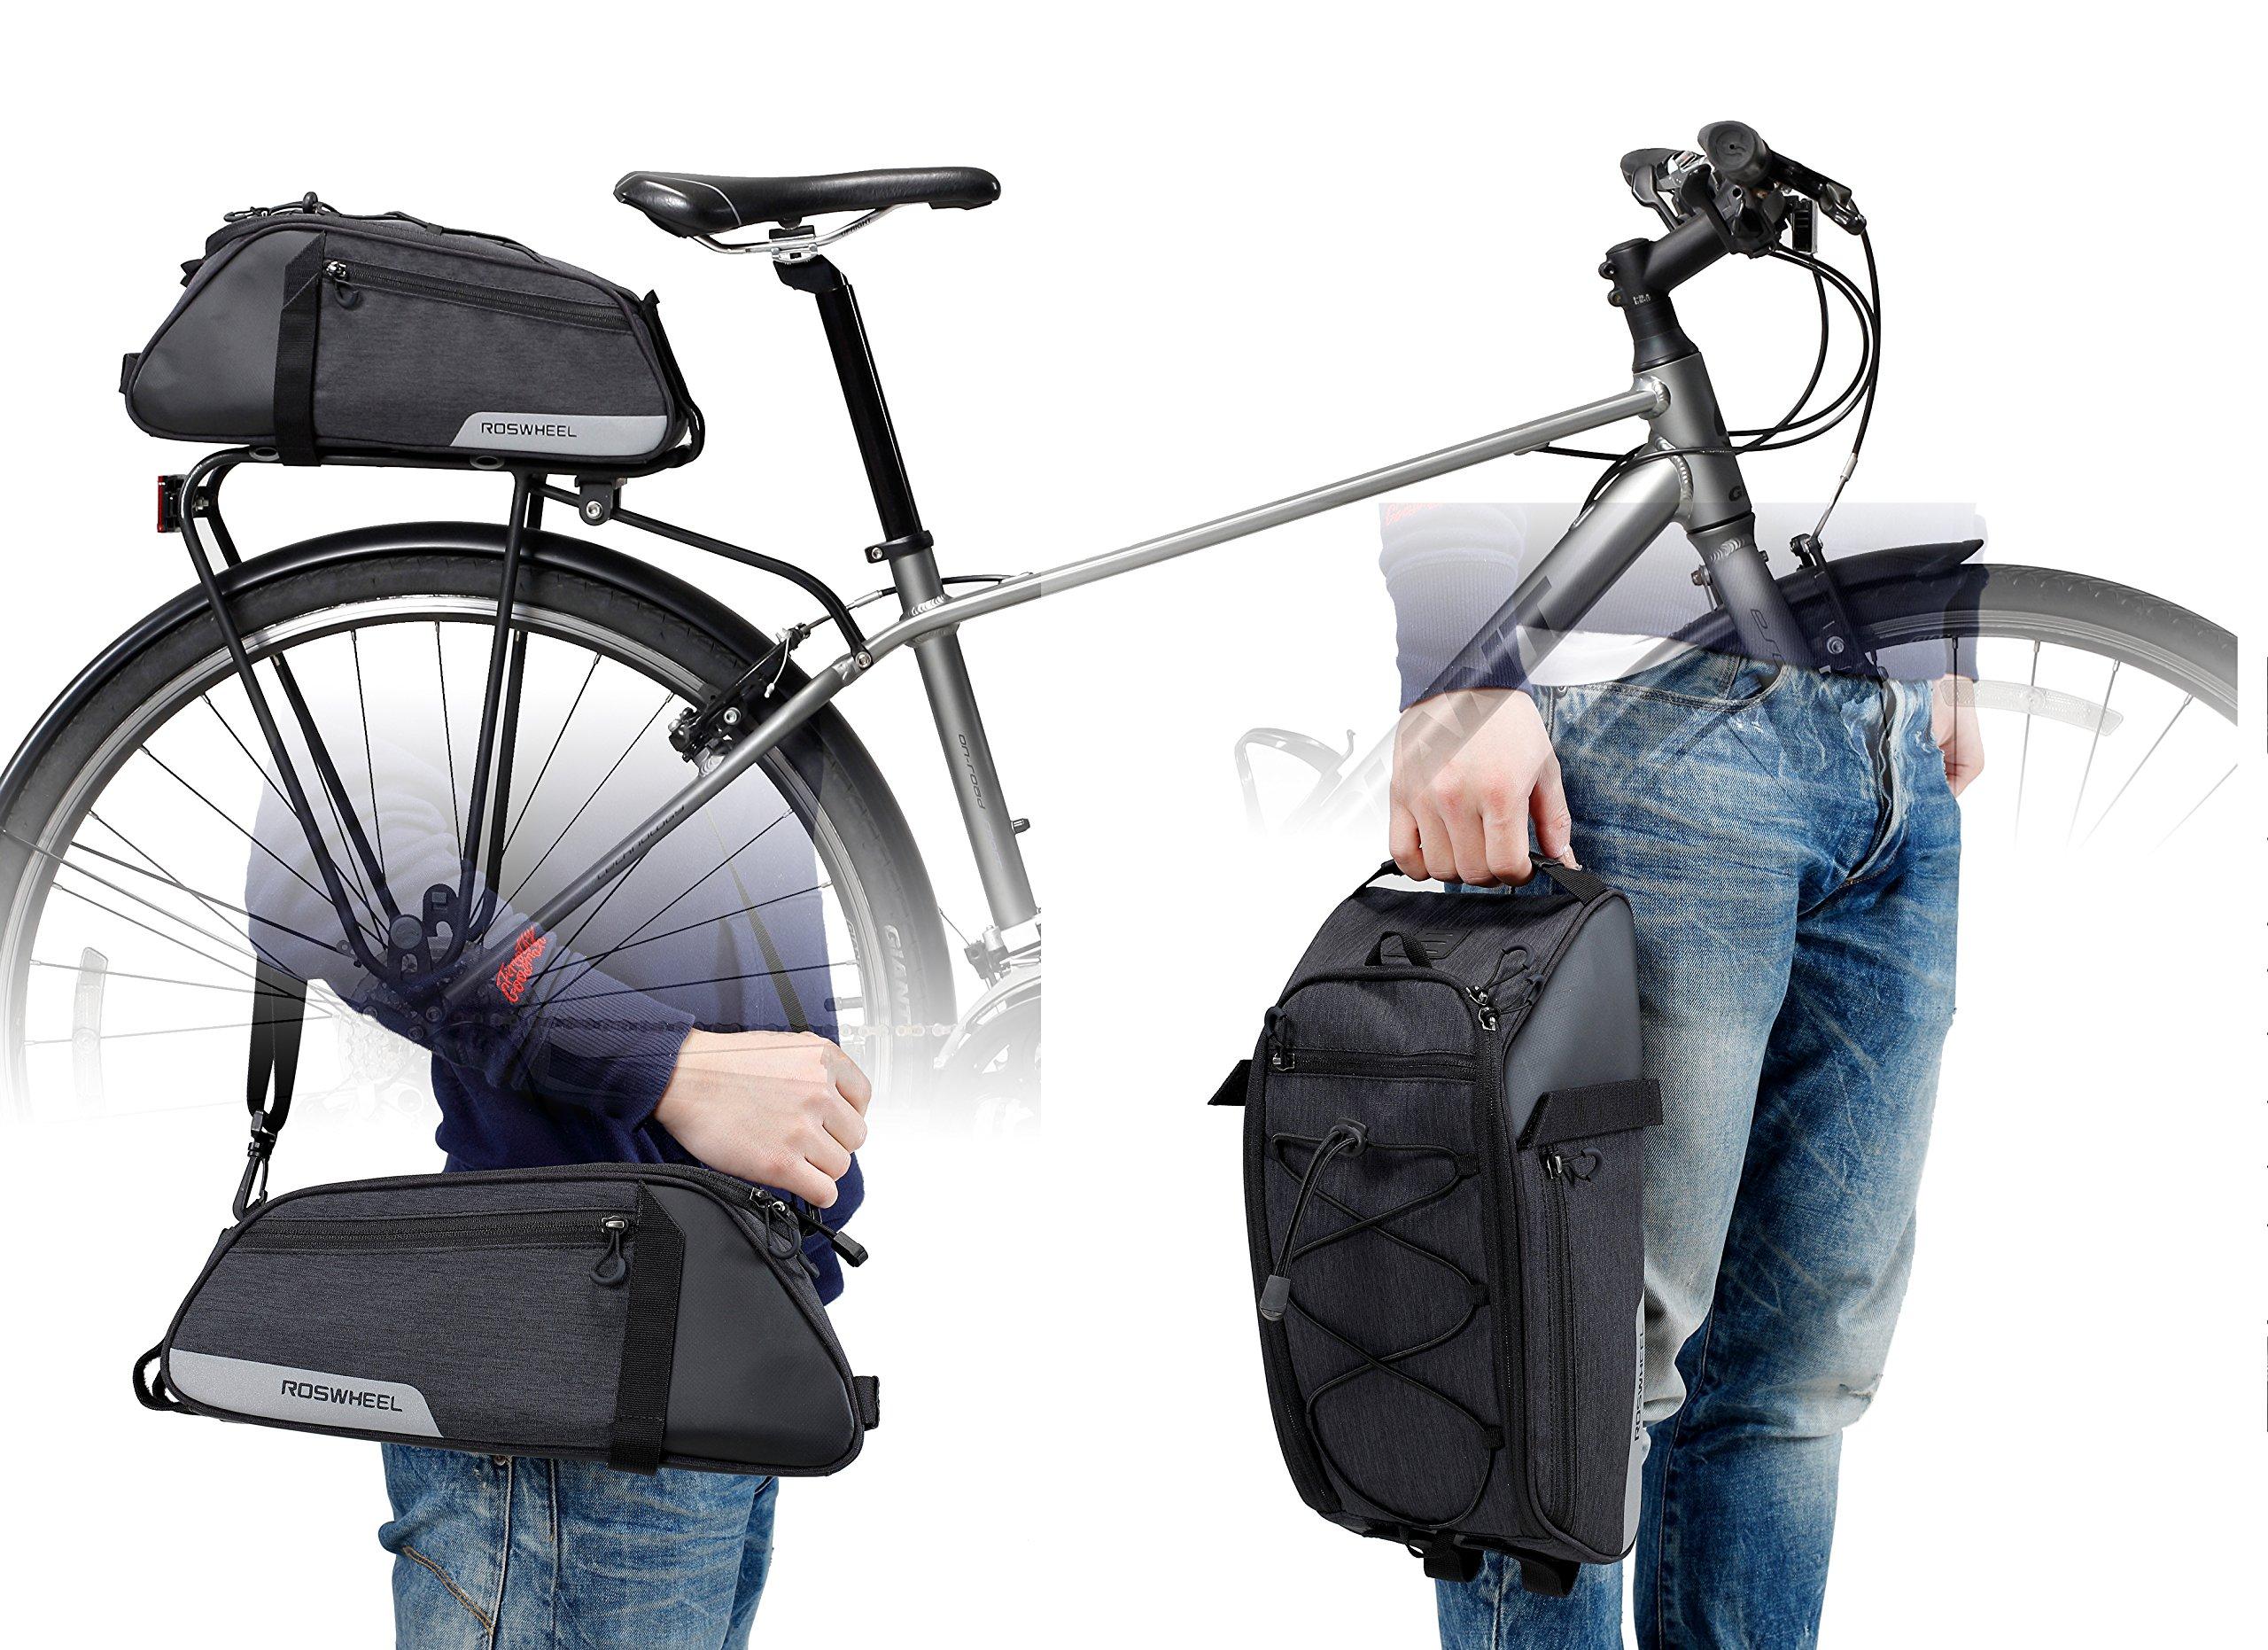 Roswheel Essentials Series 141466 Bike Trunk Bag Bicycle Rear Rack Pack Cycling Accessories Pannier, 8L Capacity by Roswheel (Image #7)